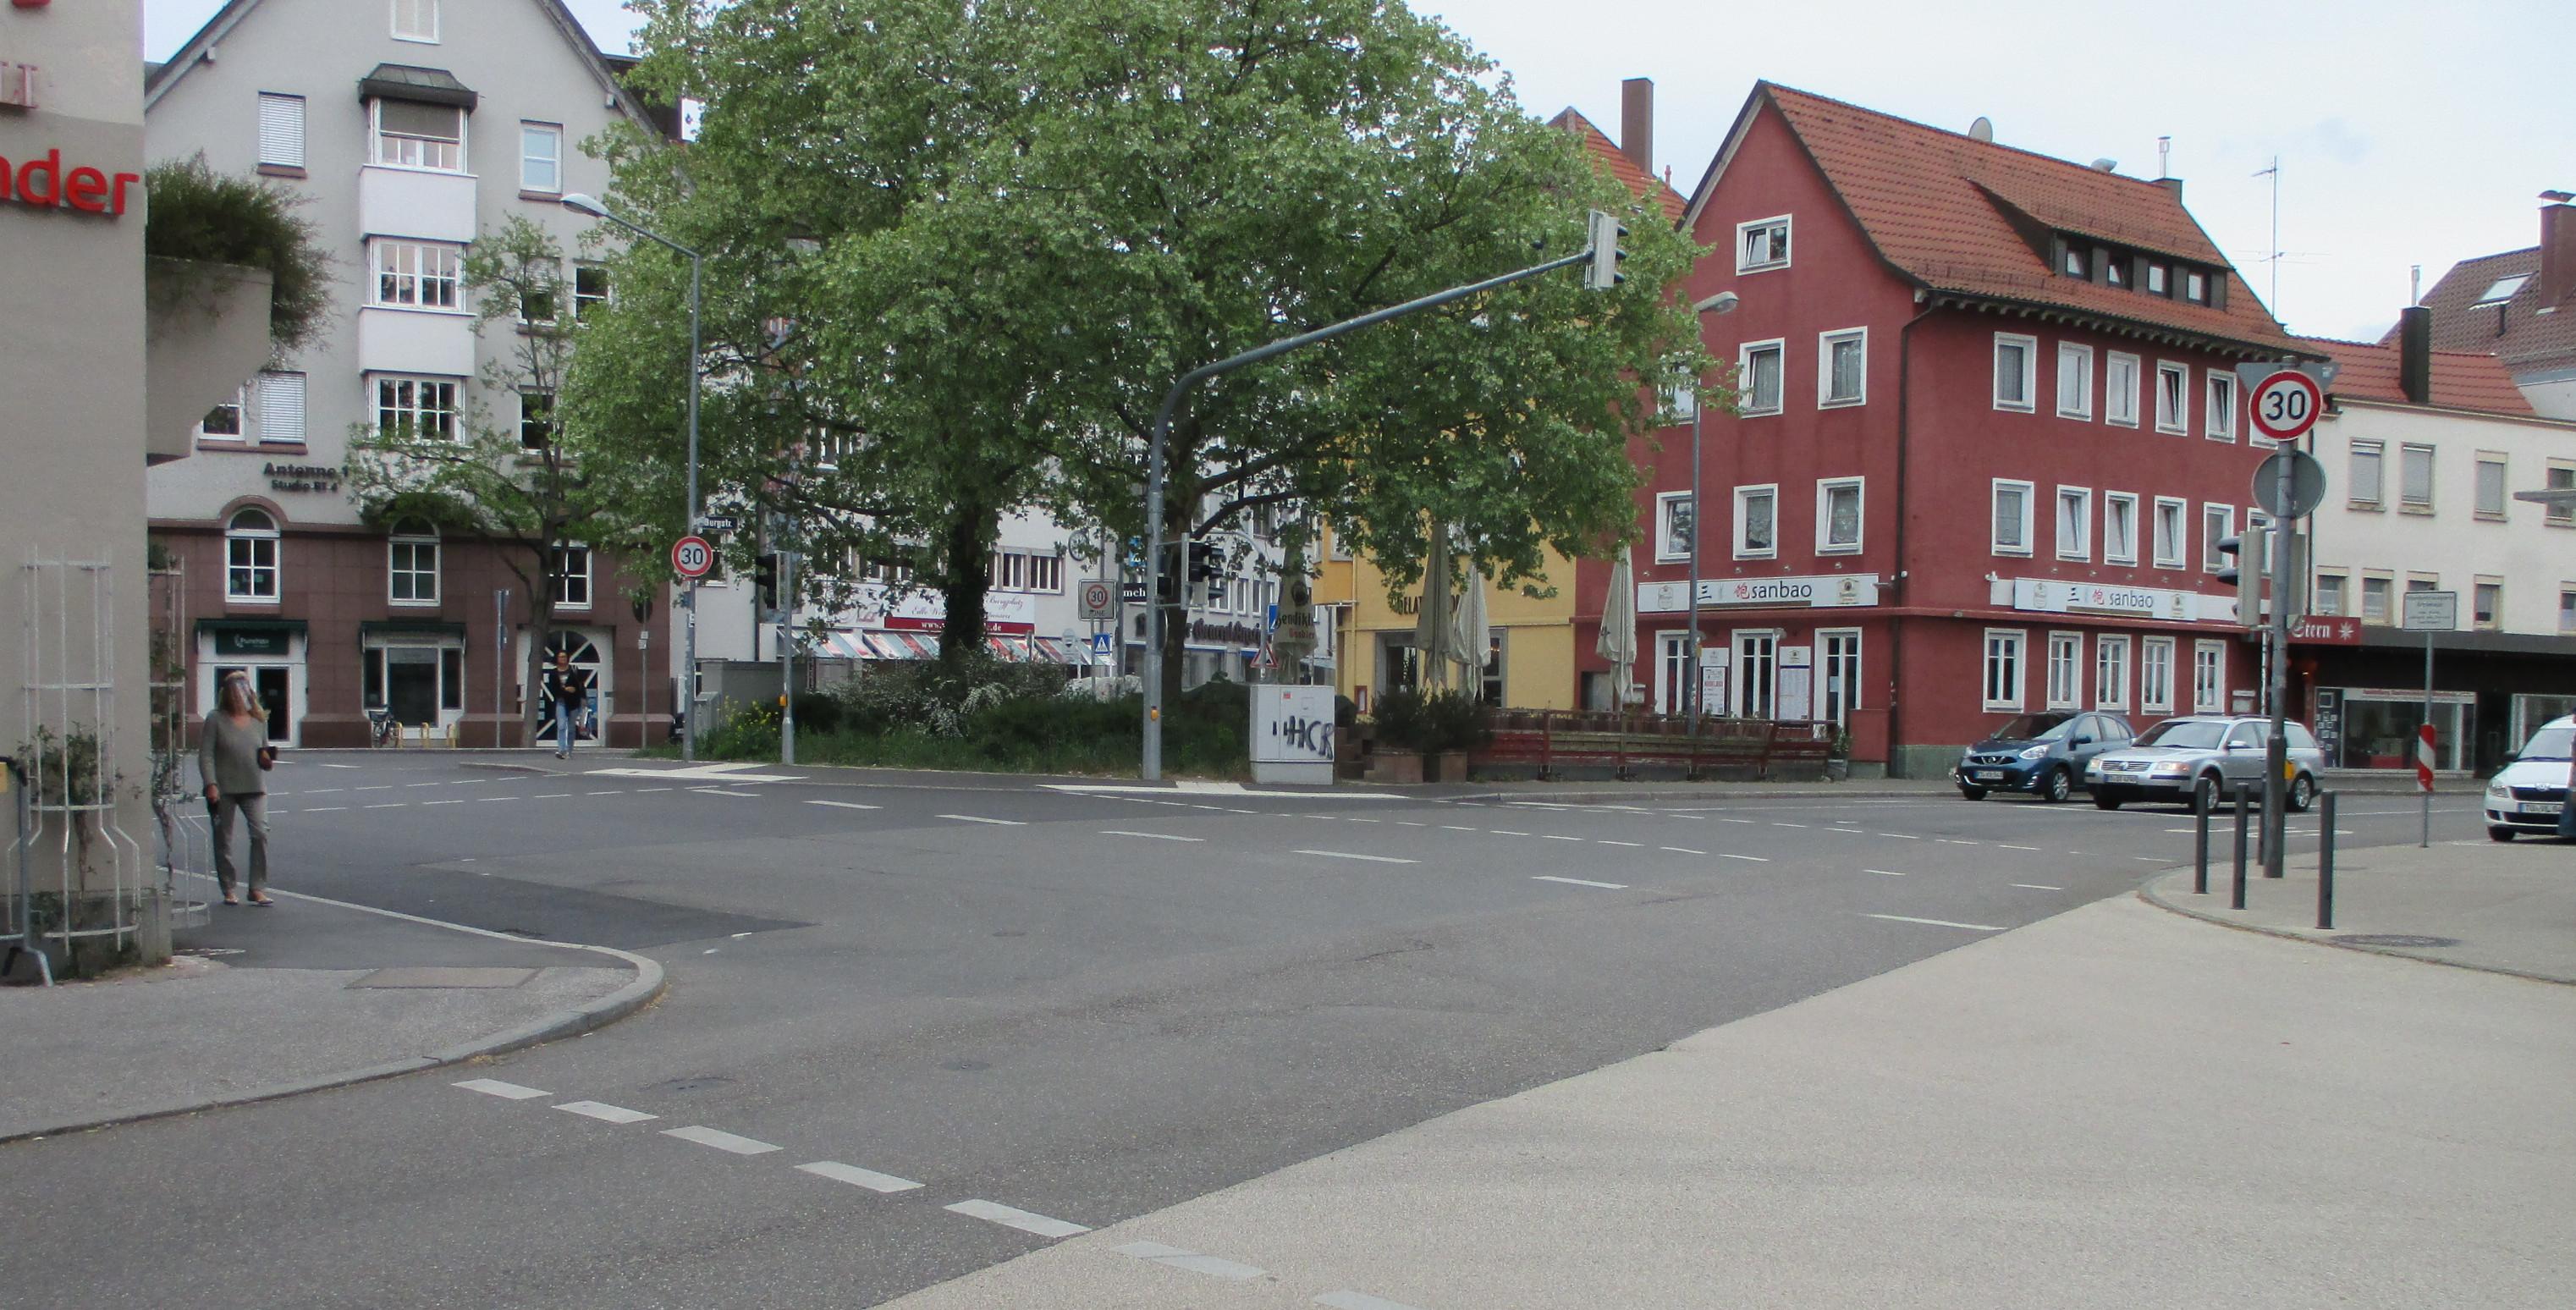 Albtorplatz